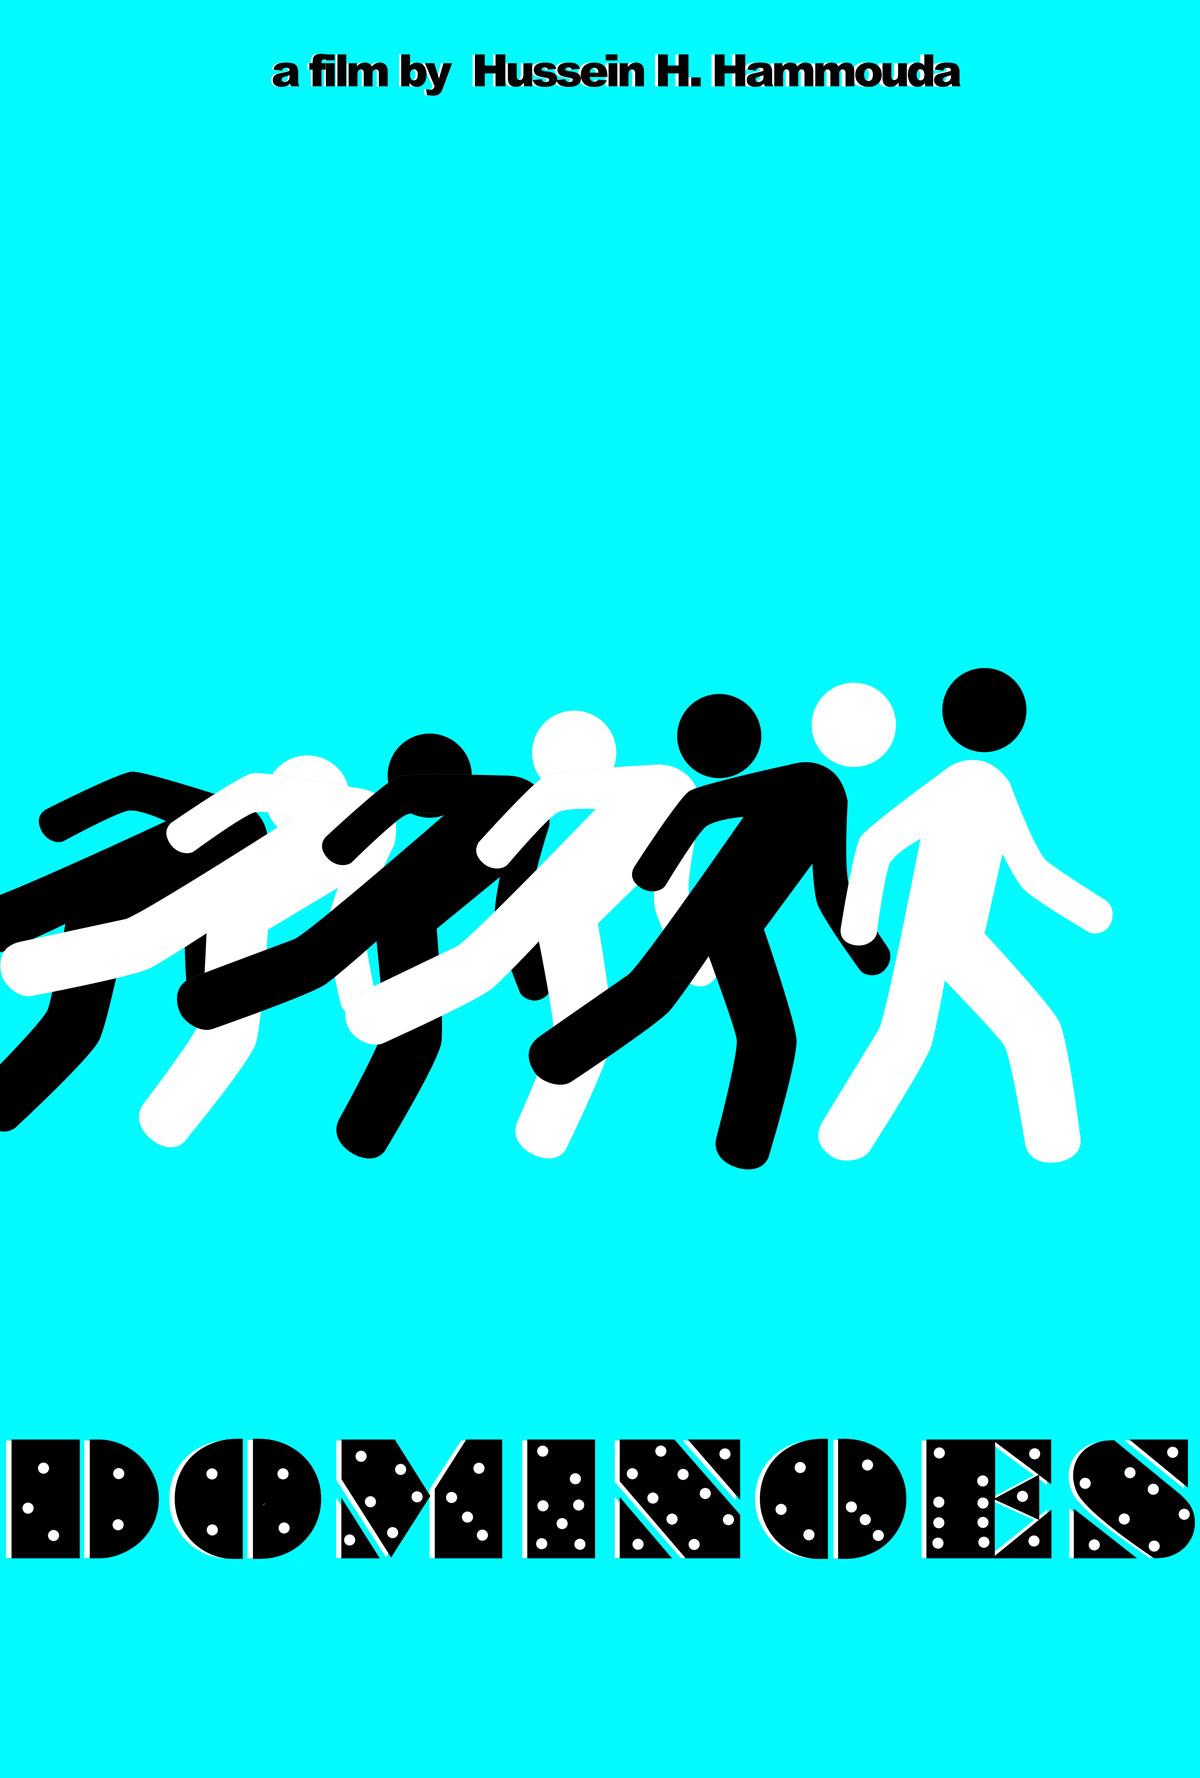 Dominoes - main image